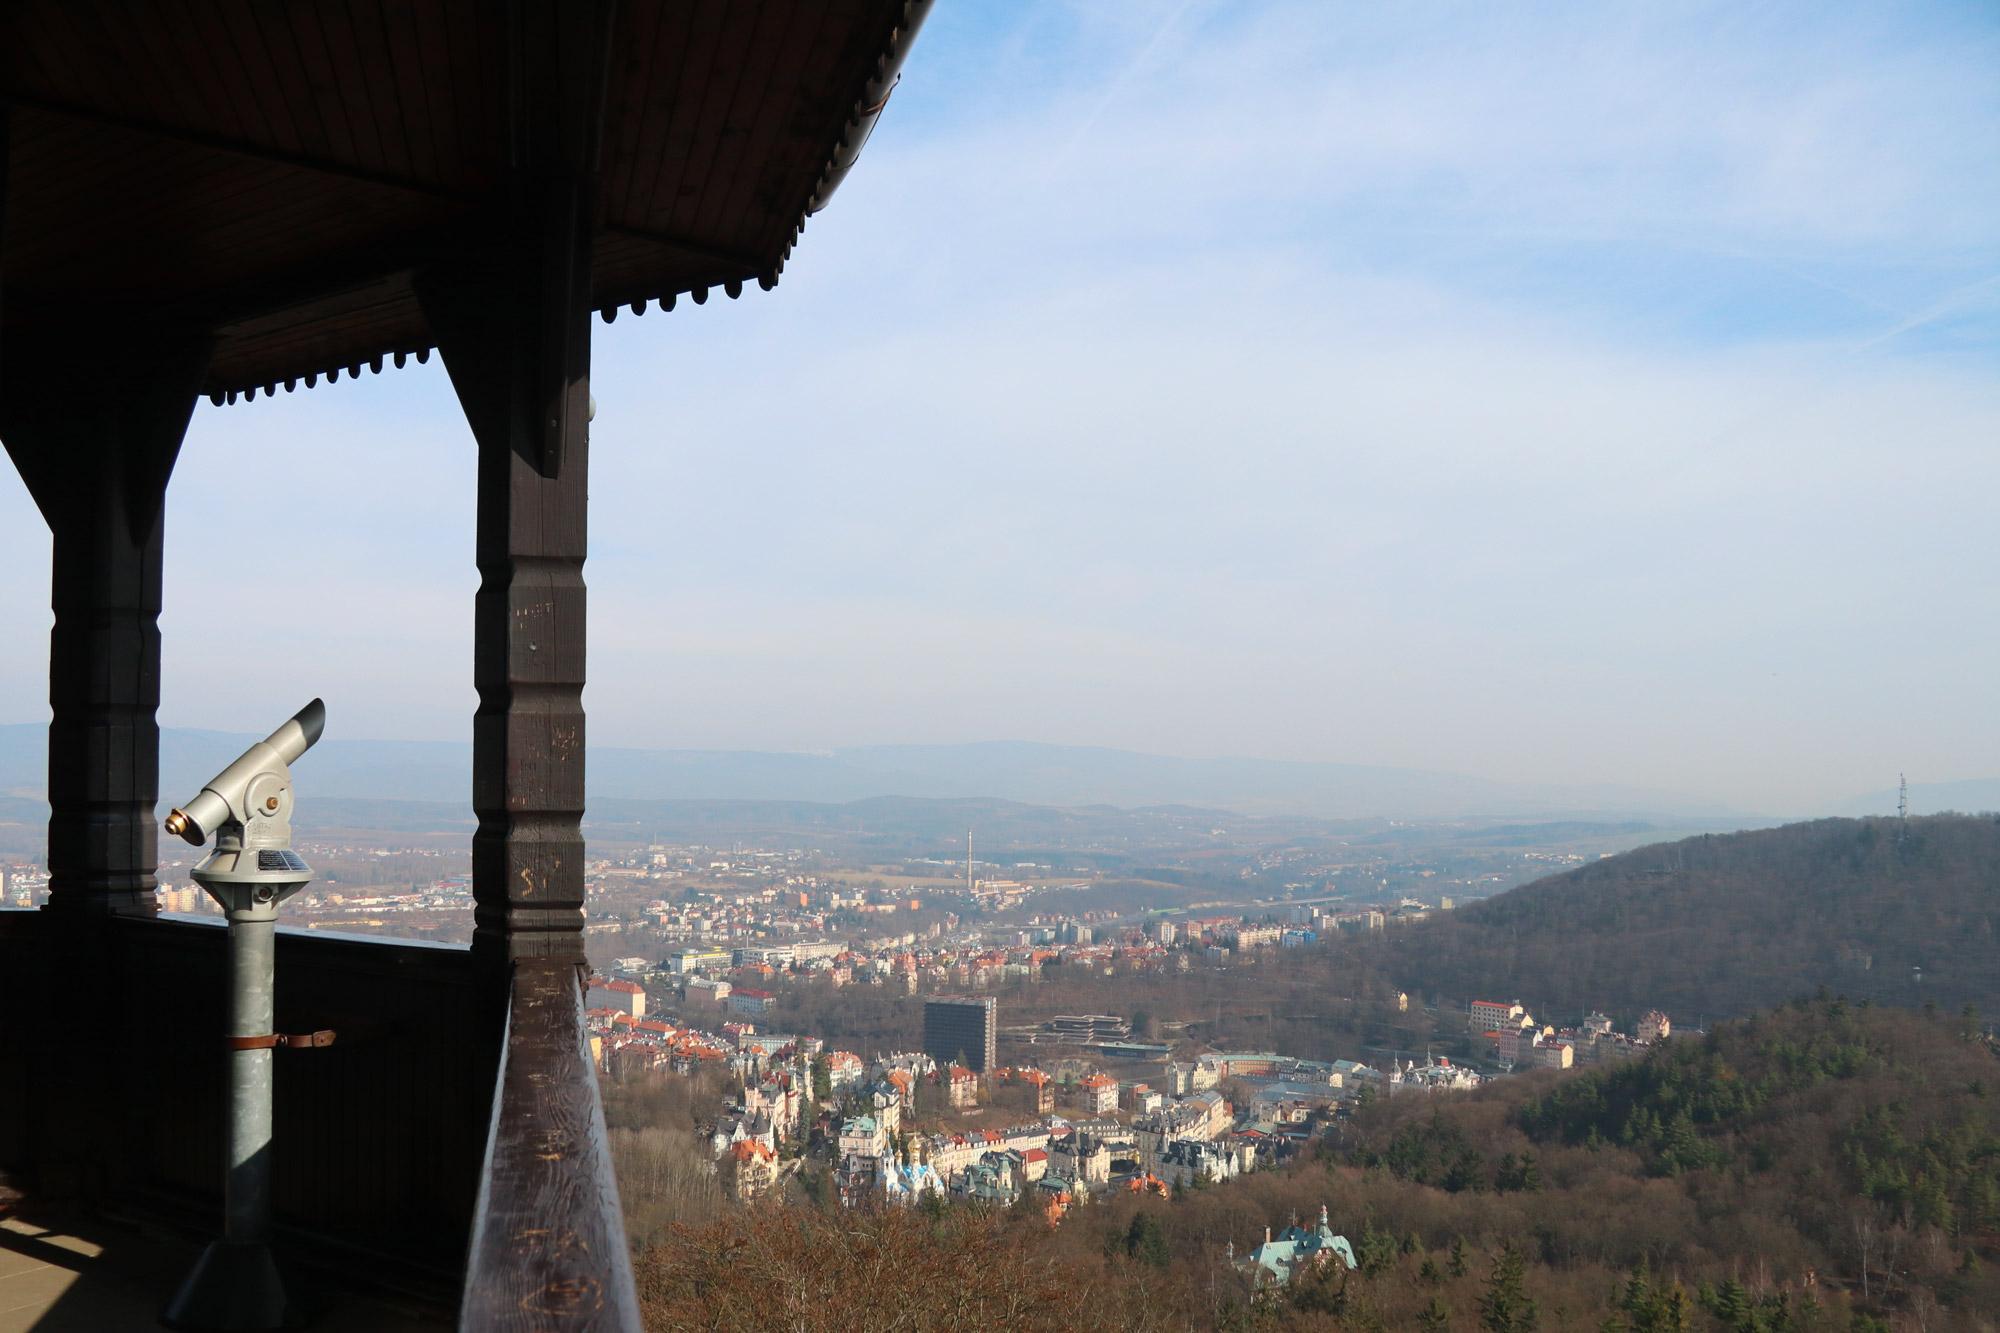 Stedentrip Karlsbad - Uitzicht vanaf de Diana toren